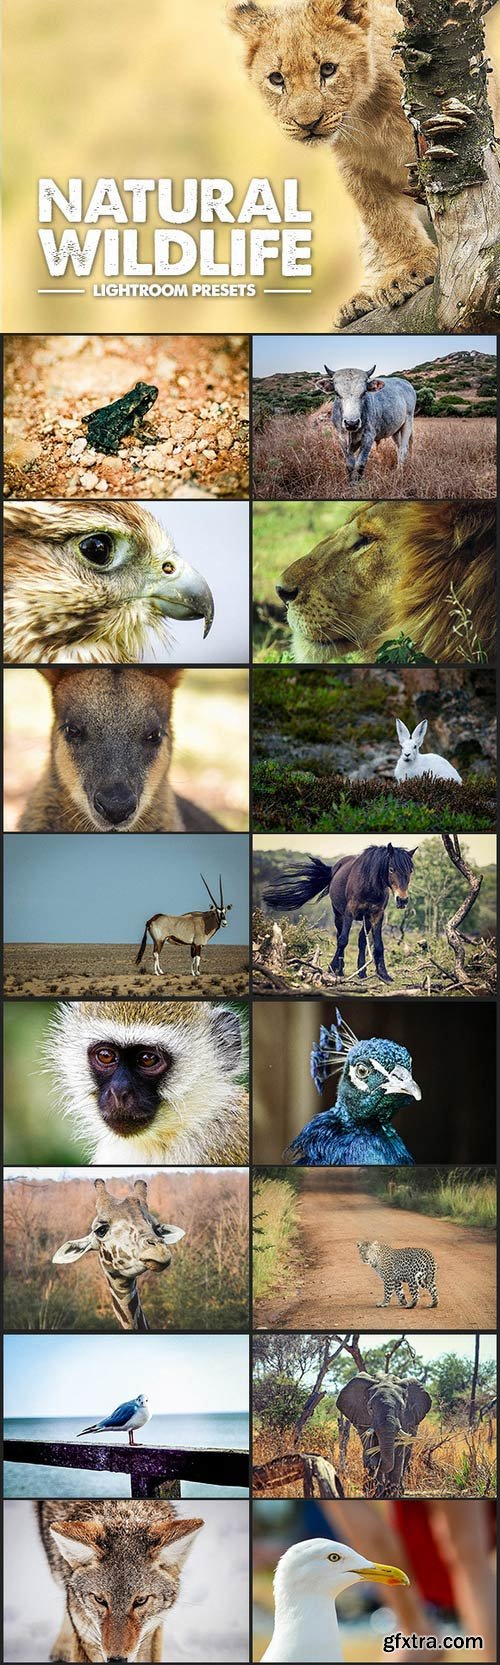 CM - Wildlife Lightroom Presets 335167